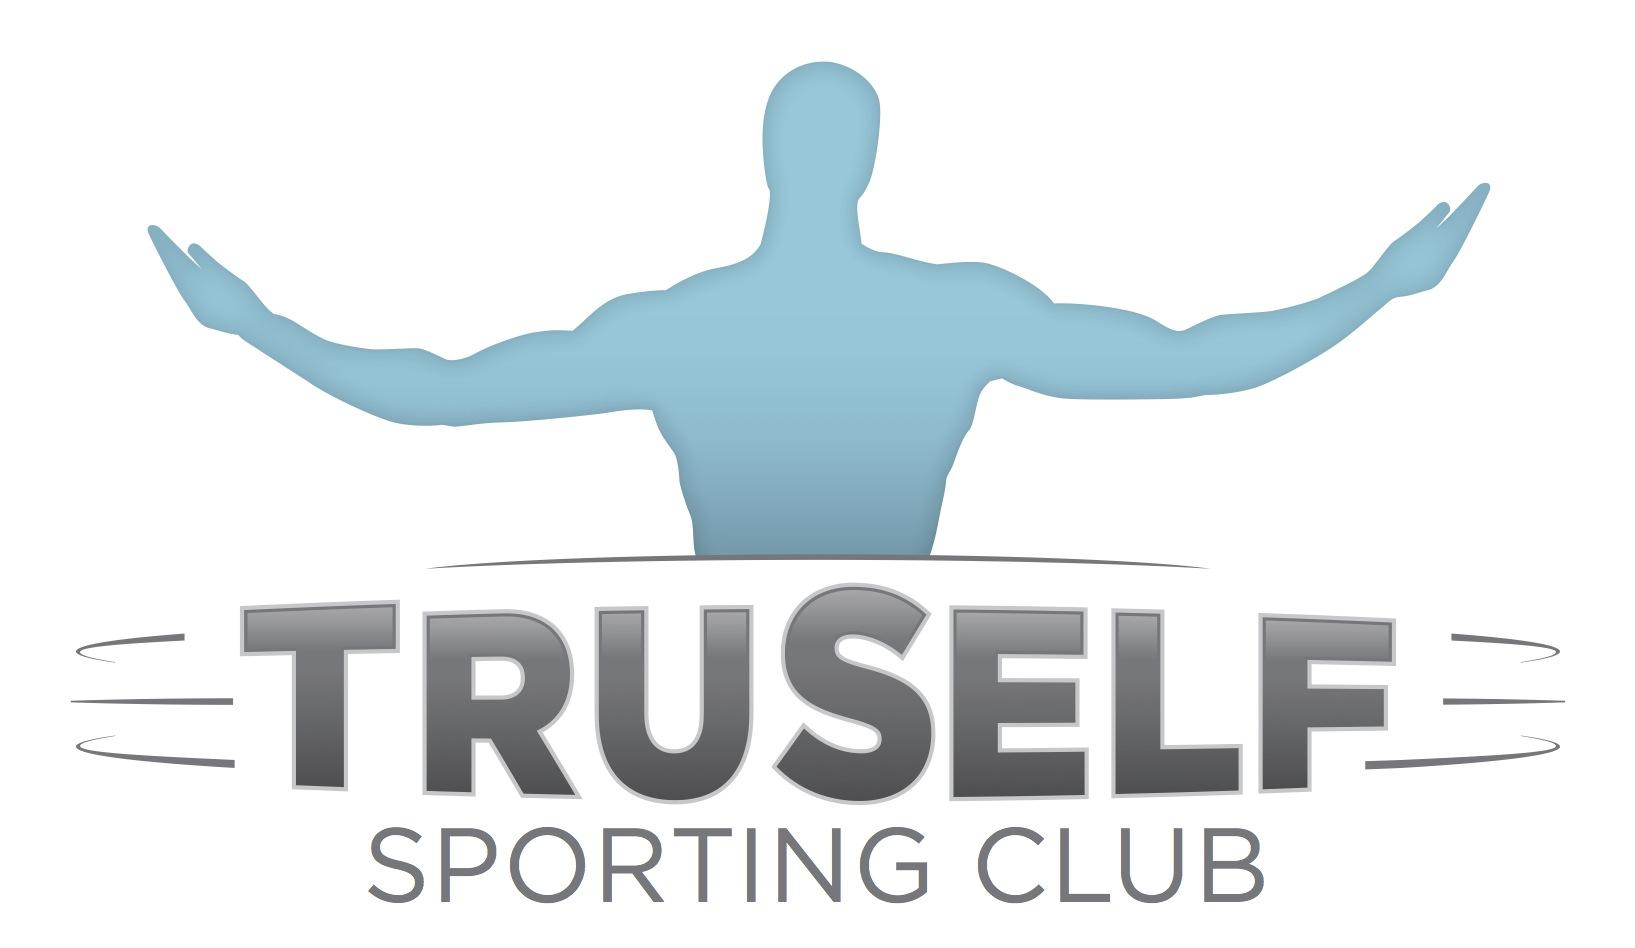 TruSelf - TruSelfSportingClub com